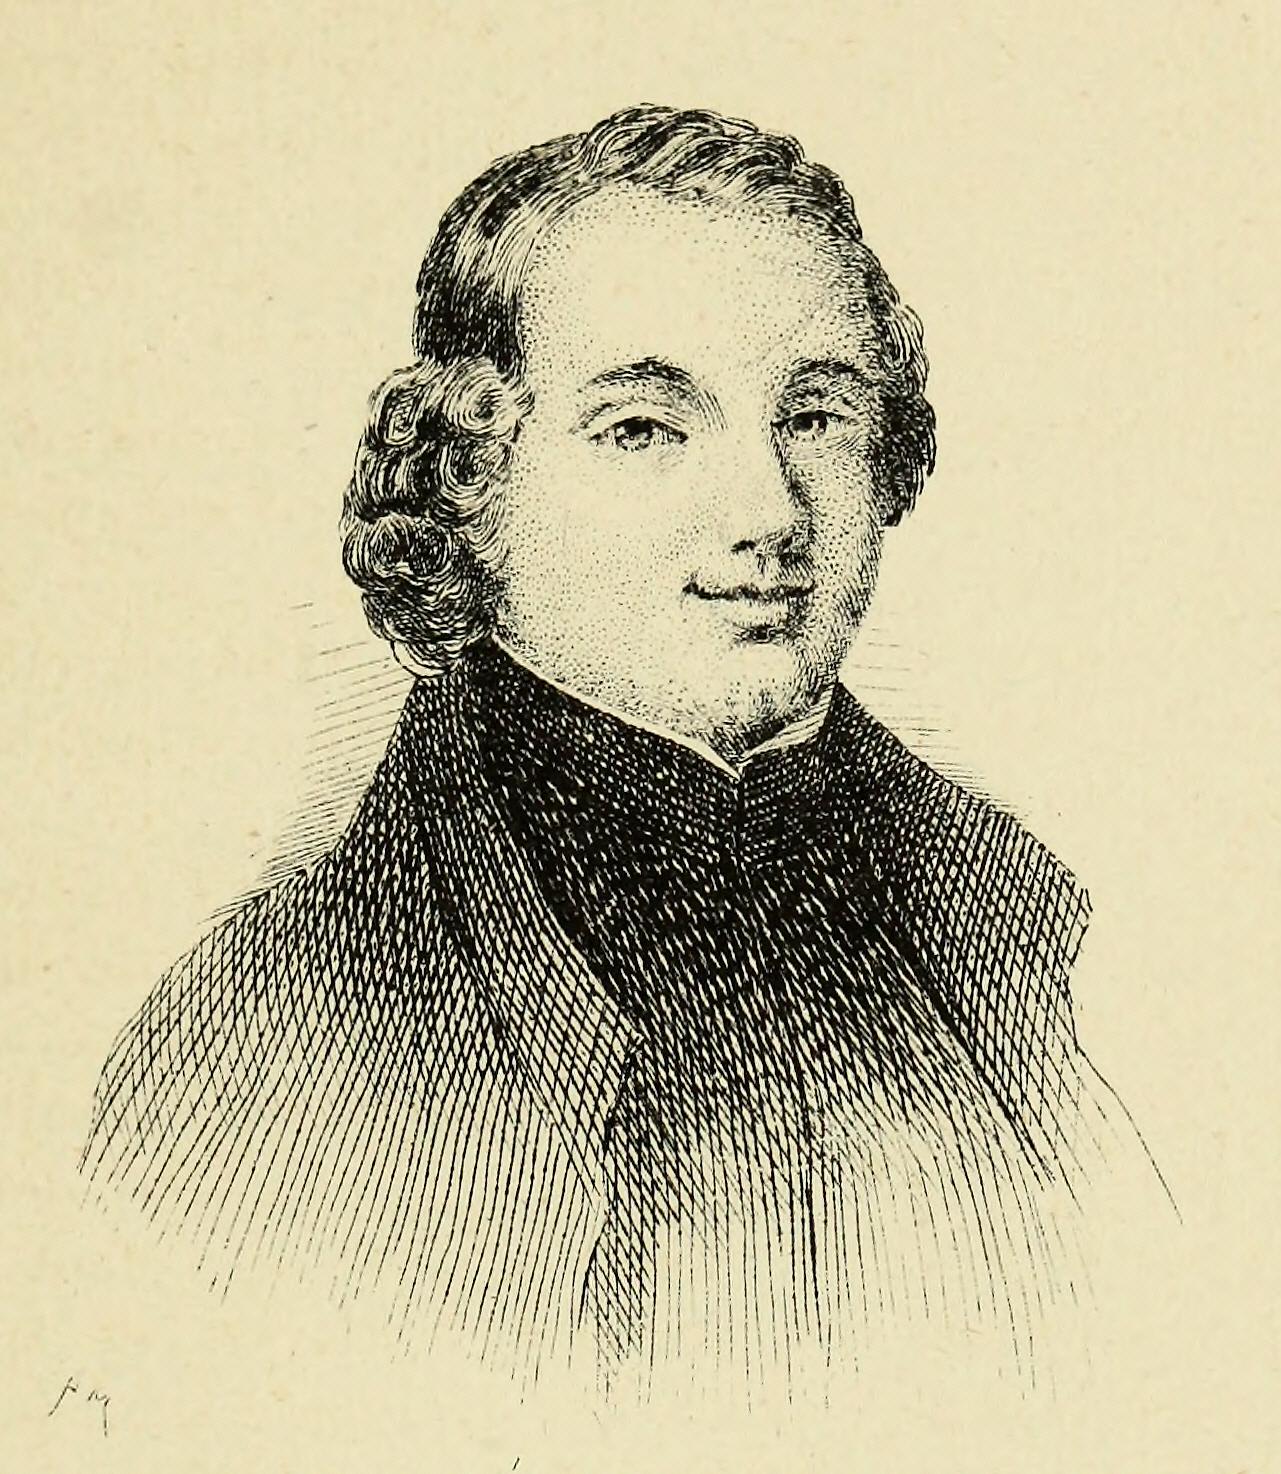 Joseph-François Lafitau - Wikipedia Joseph